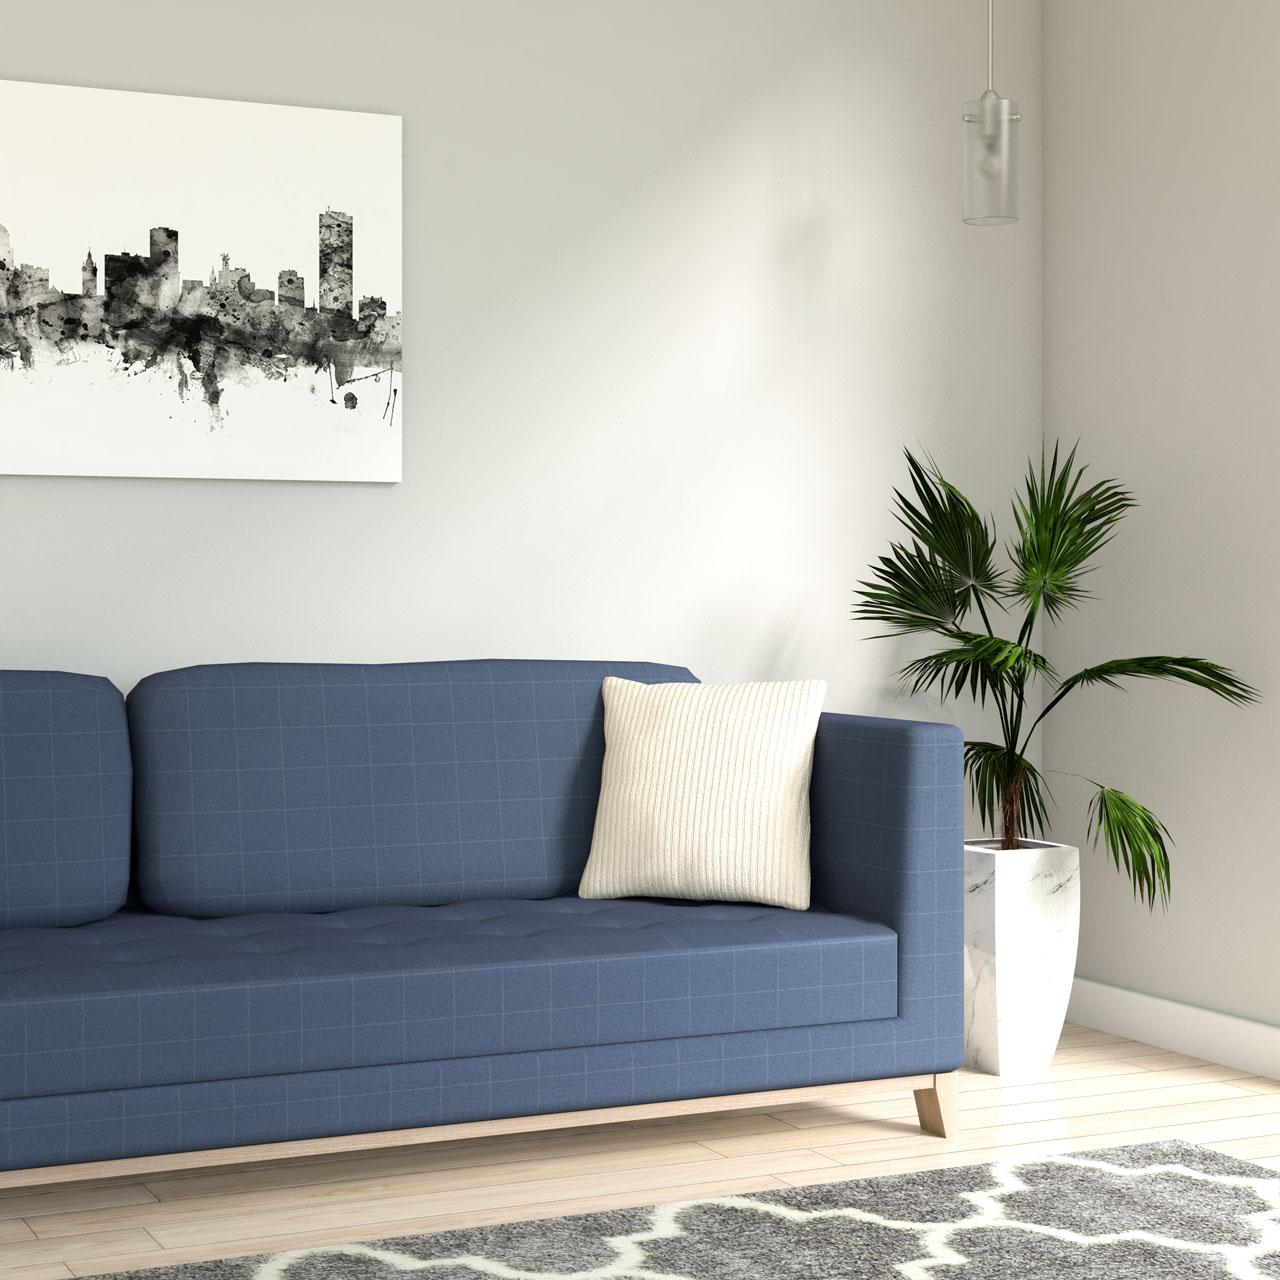 Velvet corduroy cream stripe throw pillow with blue couch